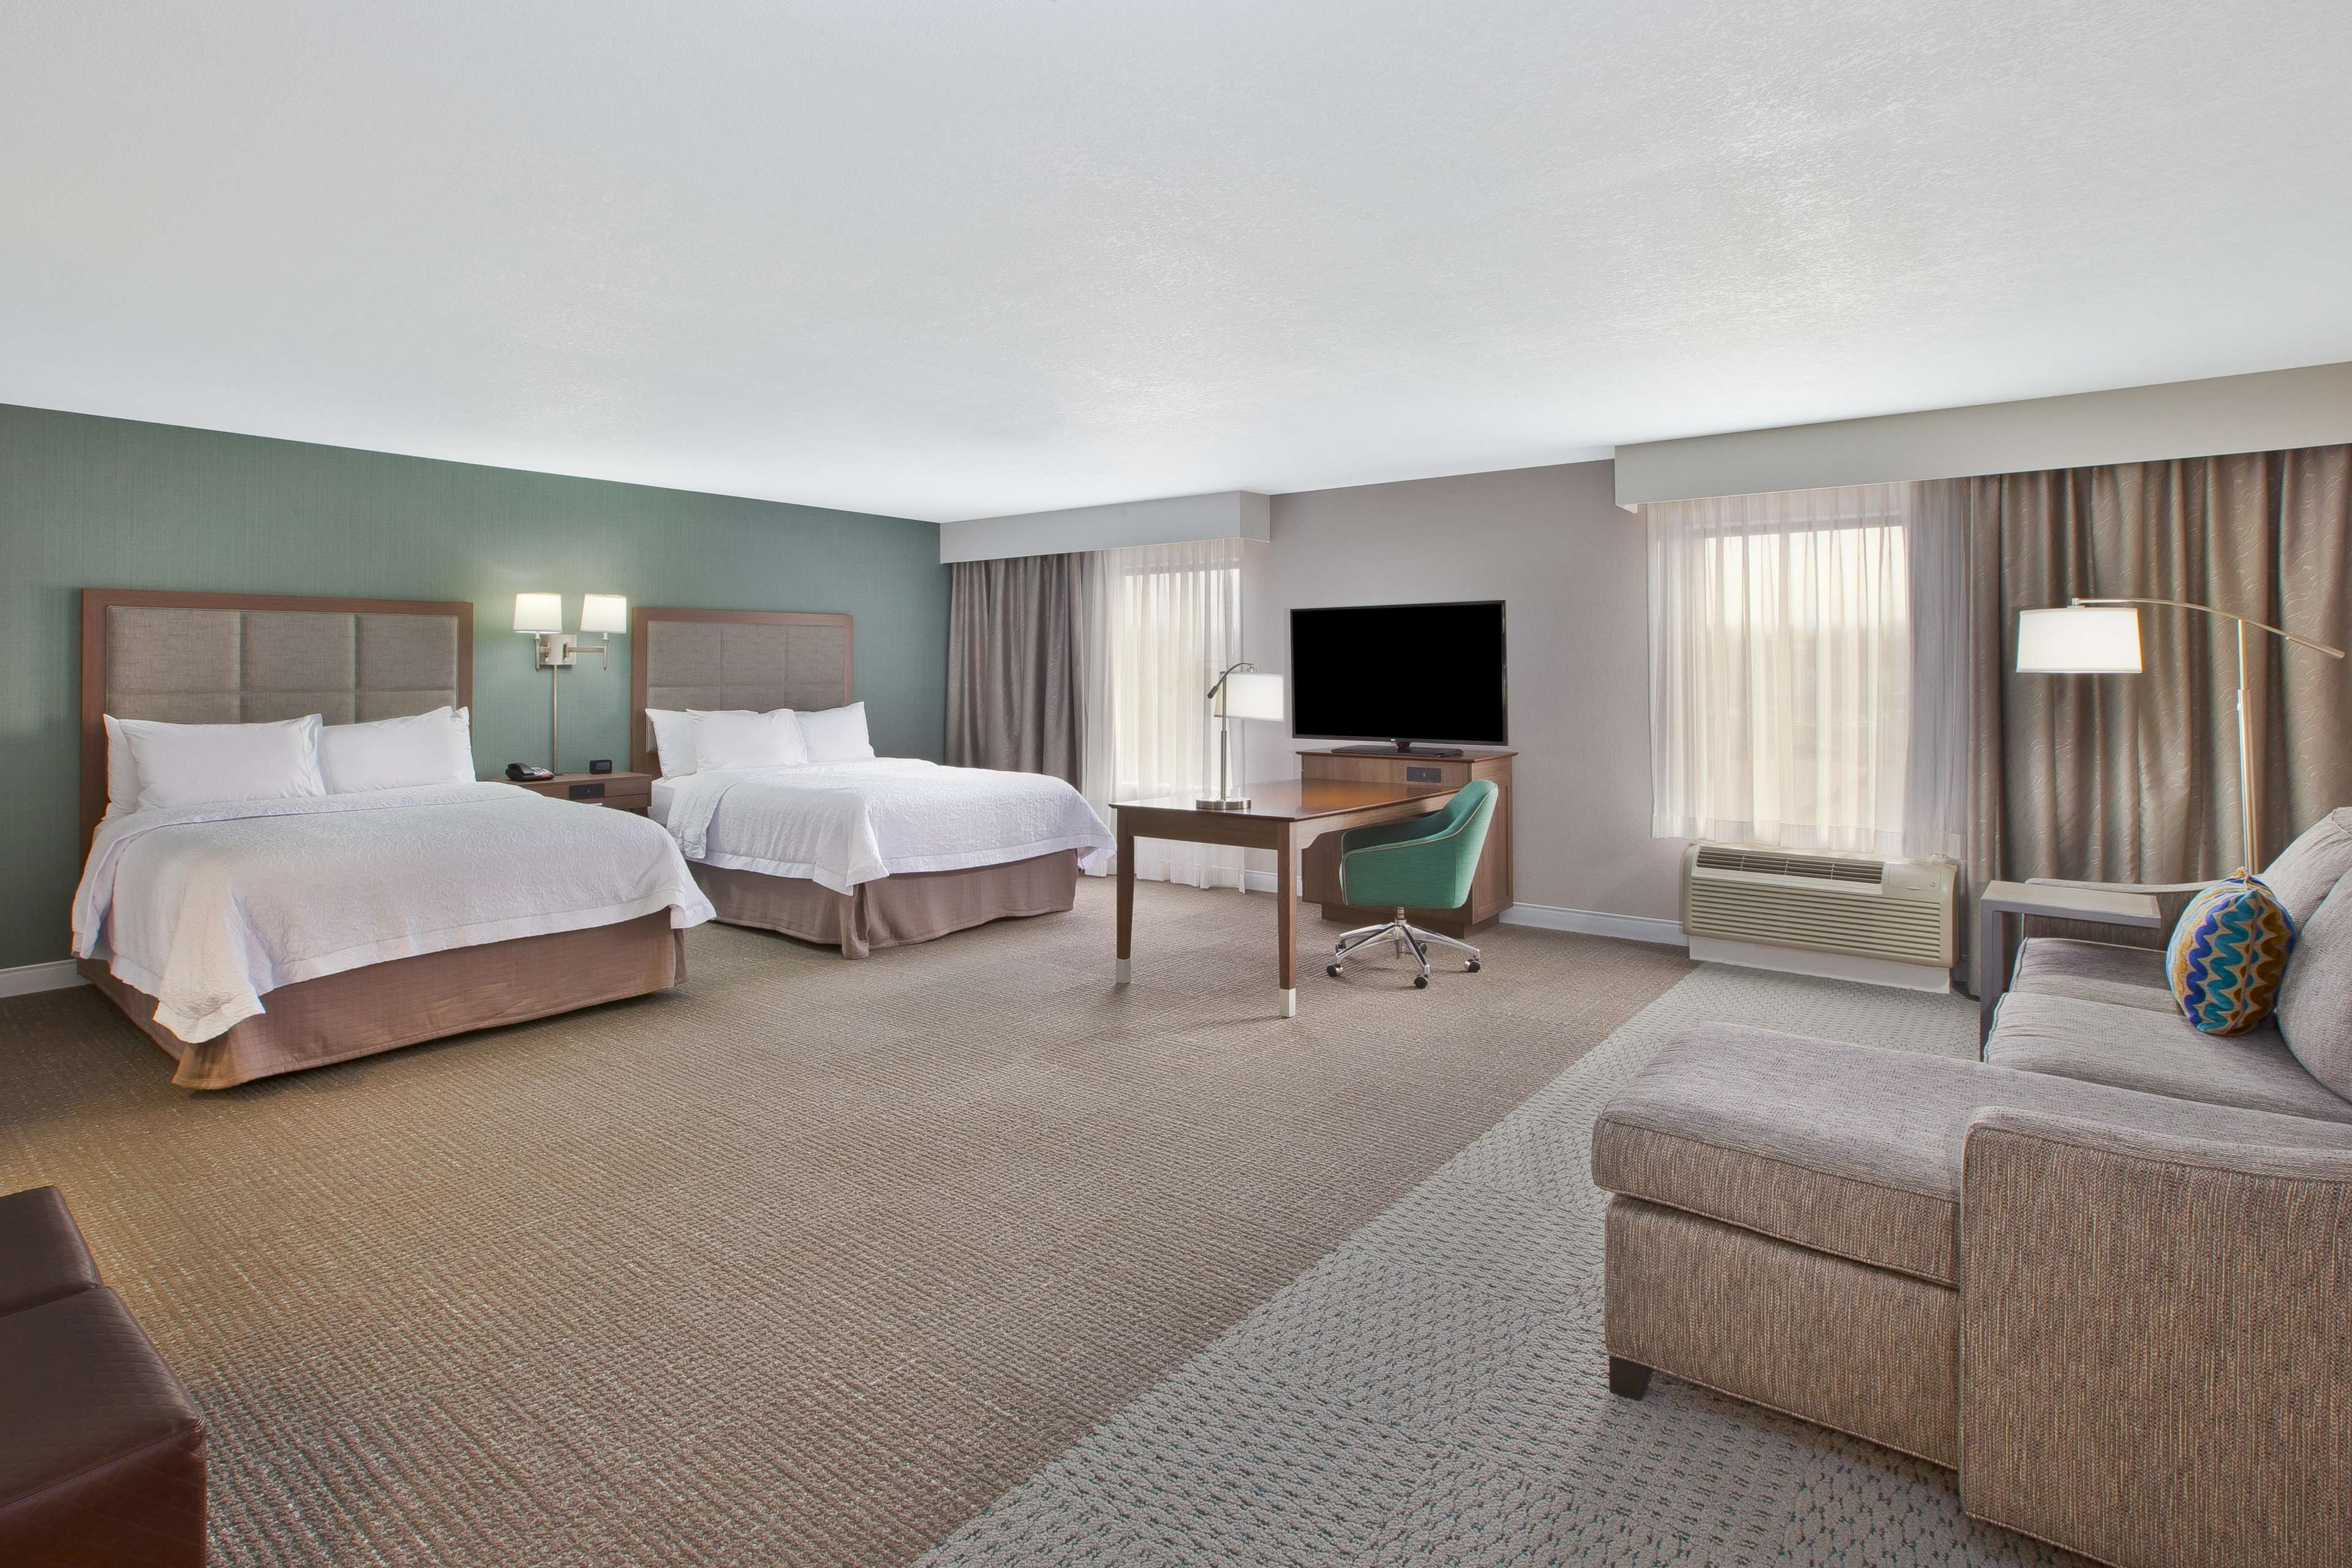 Hampton Inn & Suites Alliance image 18